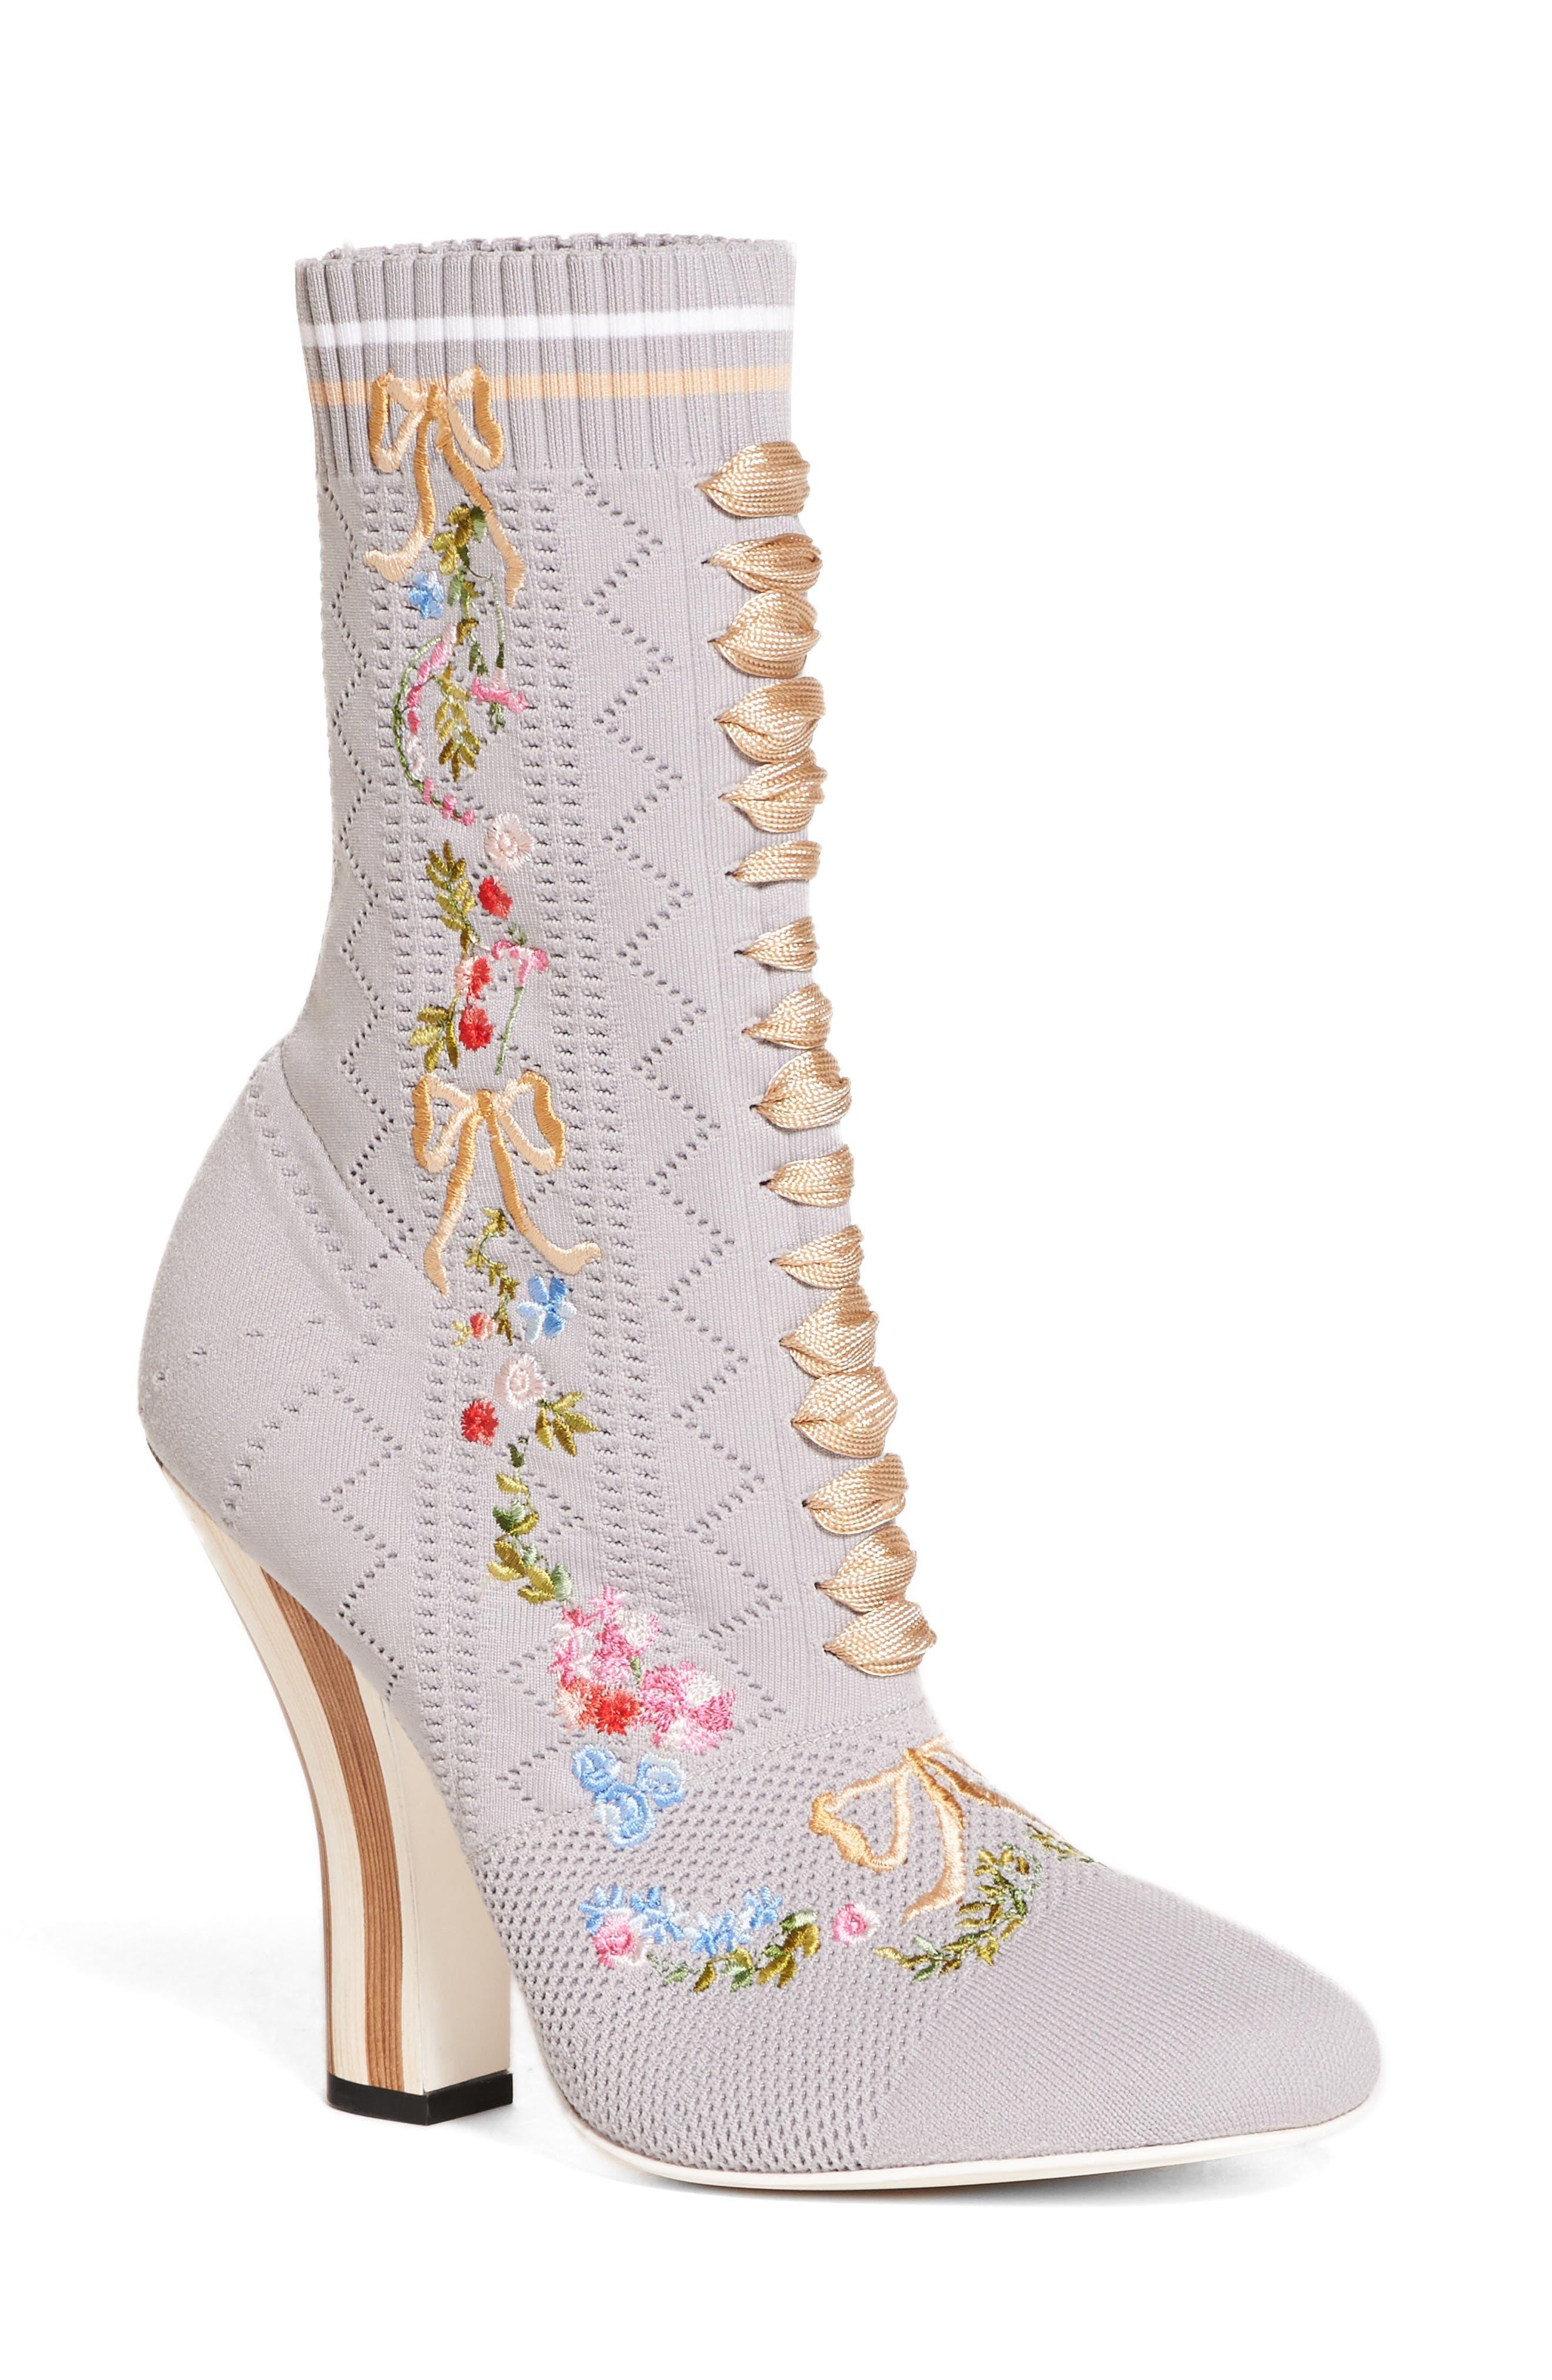 FENDI Floral Sock Bootie